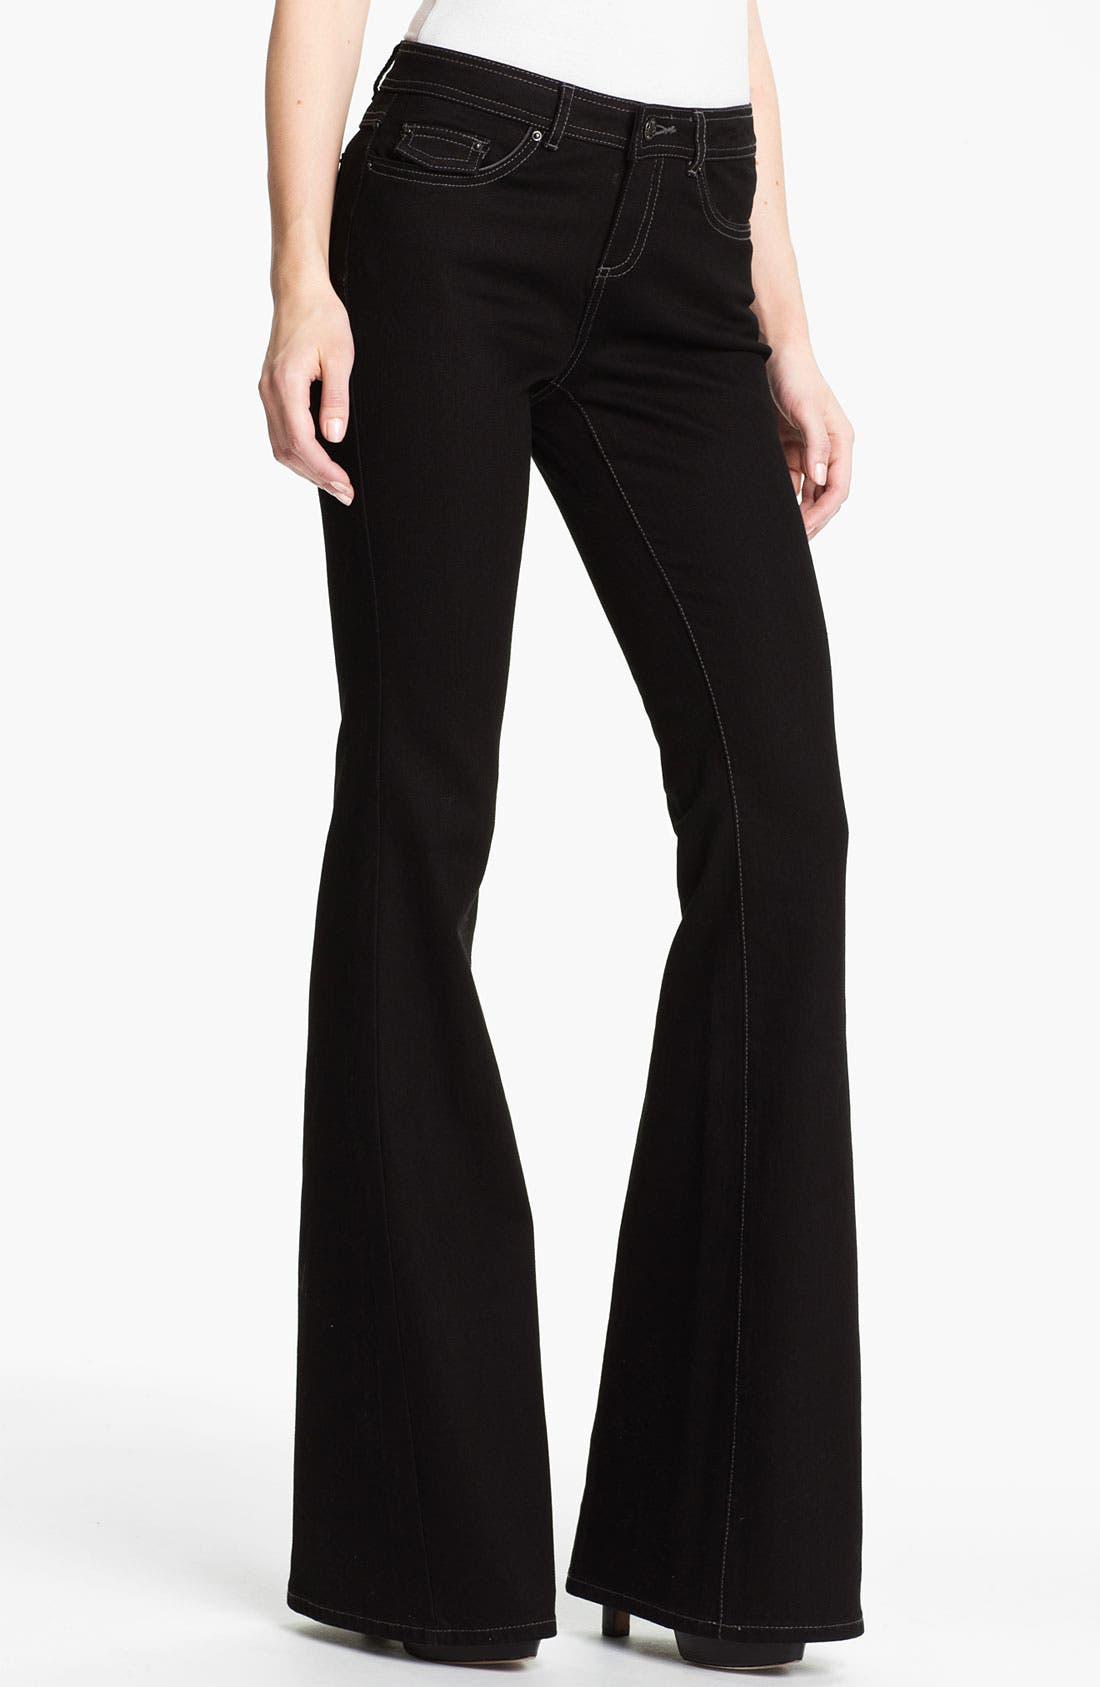 Alternate Image 1 Selected - Rachel Zoe 'Rachel' Flare Leg Jeans (Long)